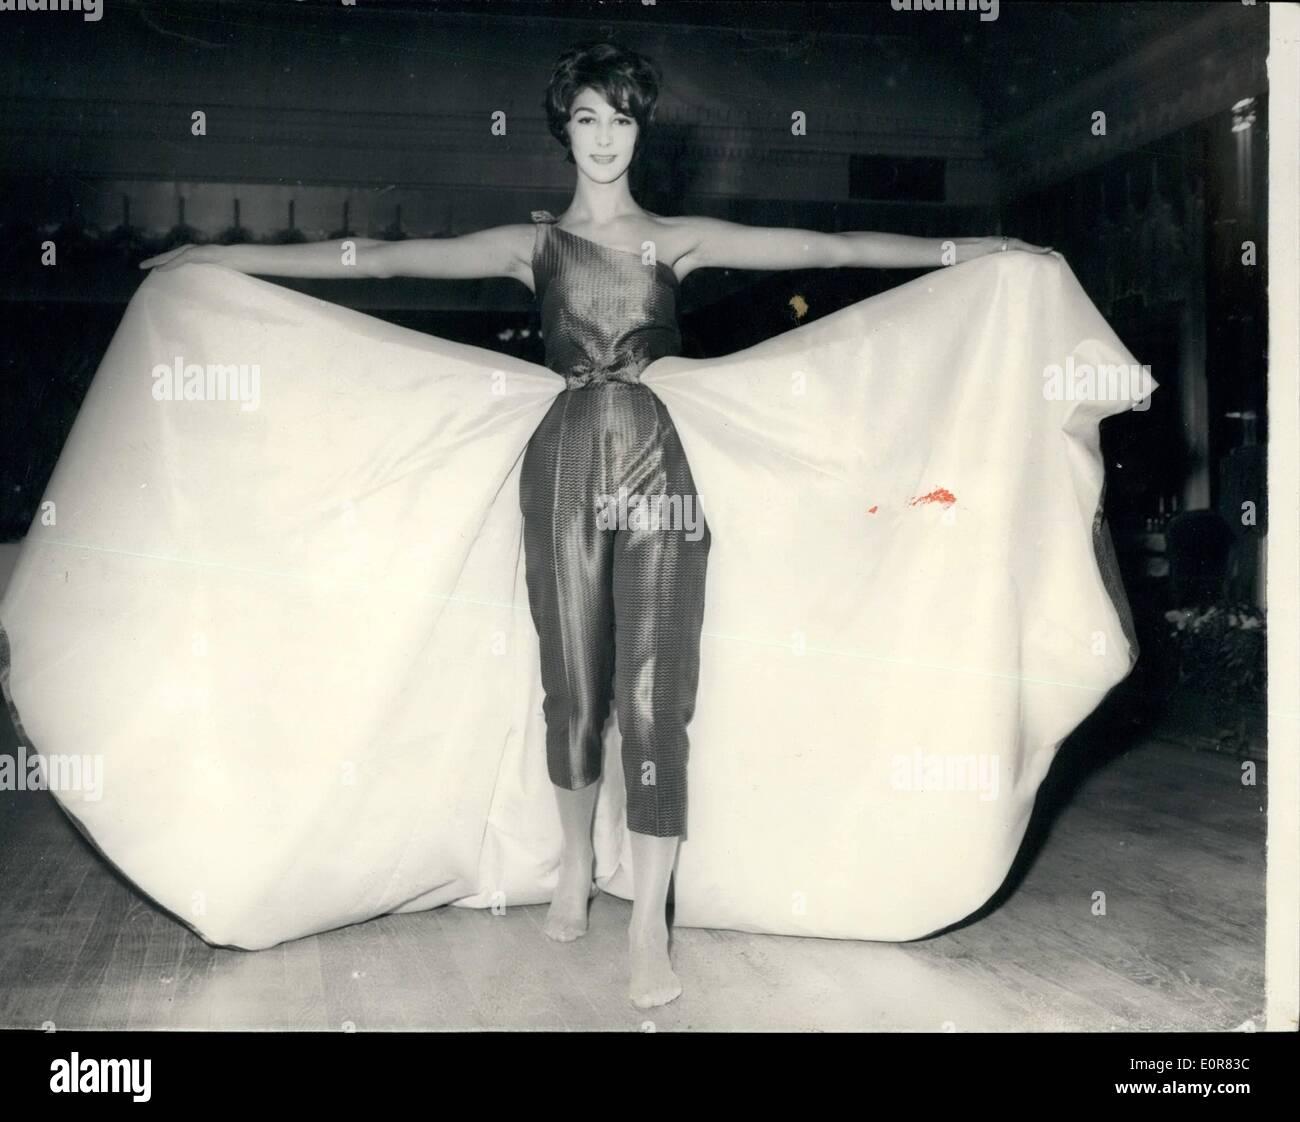 Beauty 1958 Stockfotos & Beauty 1958 Bilder - Alamy